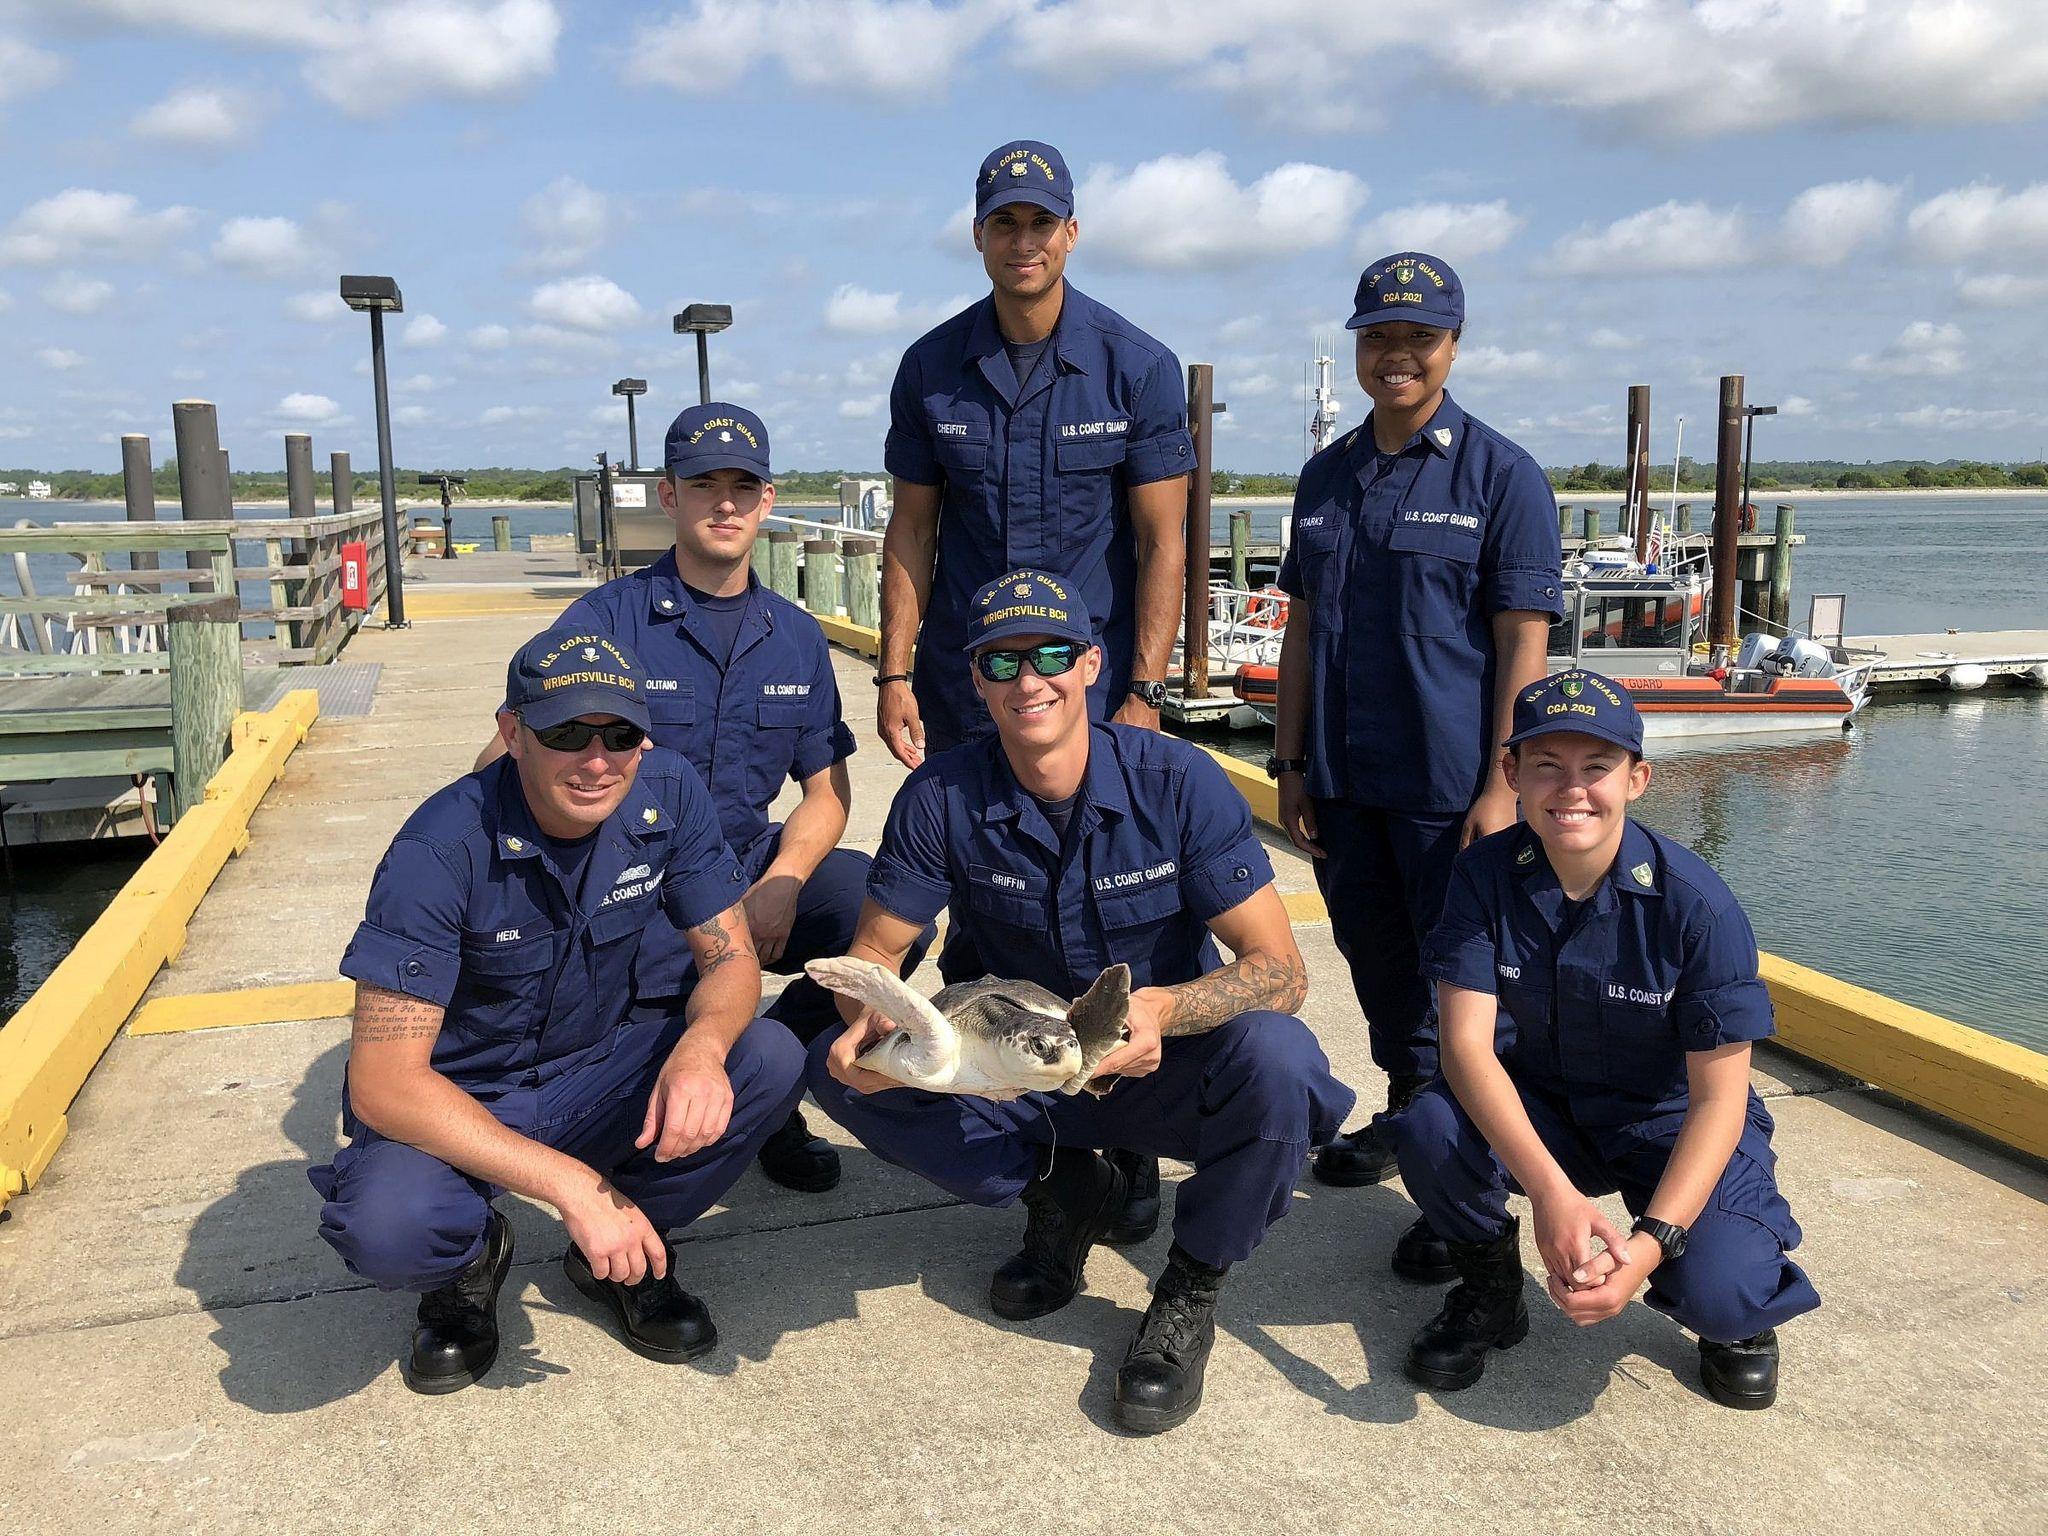 Sea turtle and rescue crew off the coast of North Carolina.